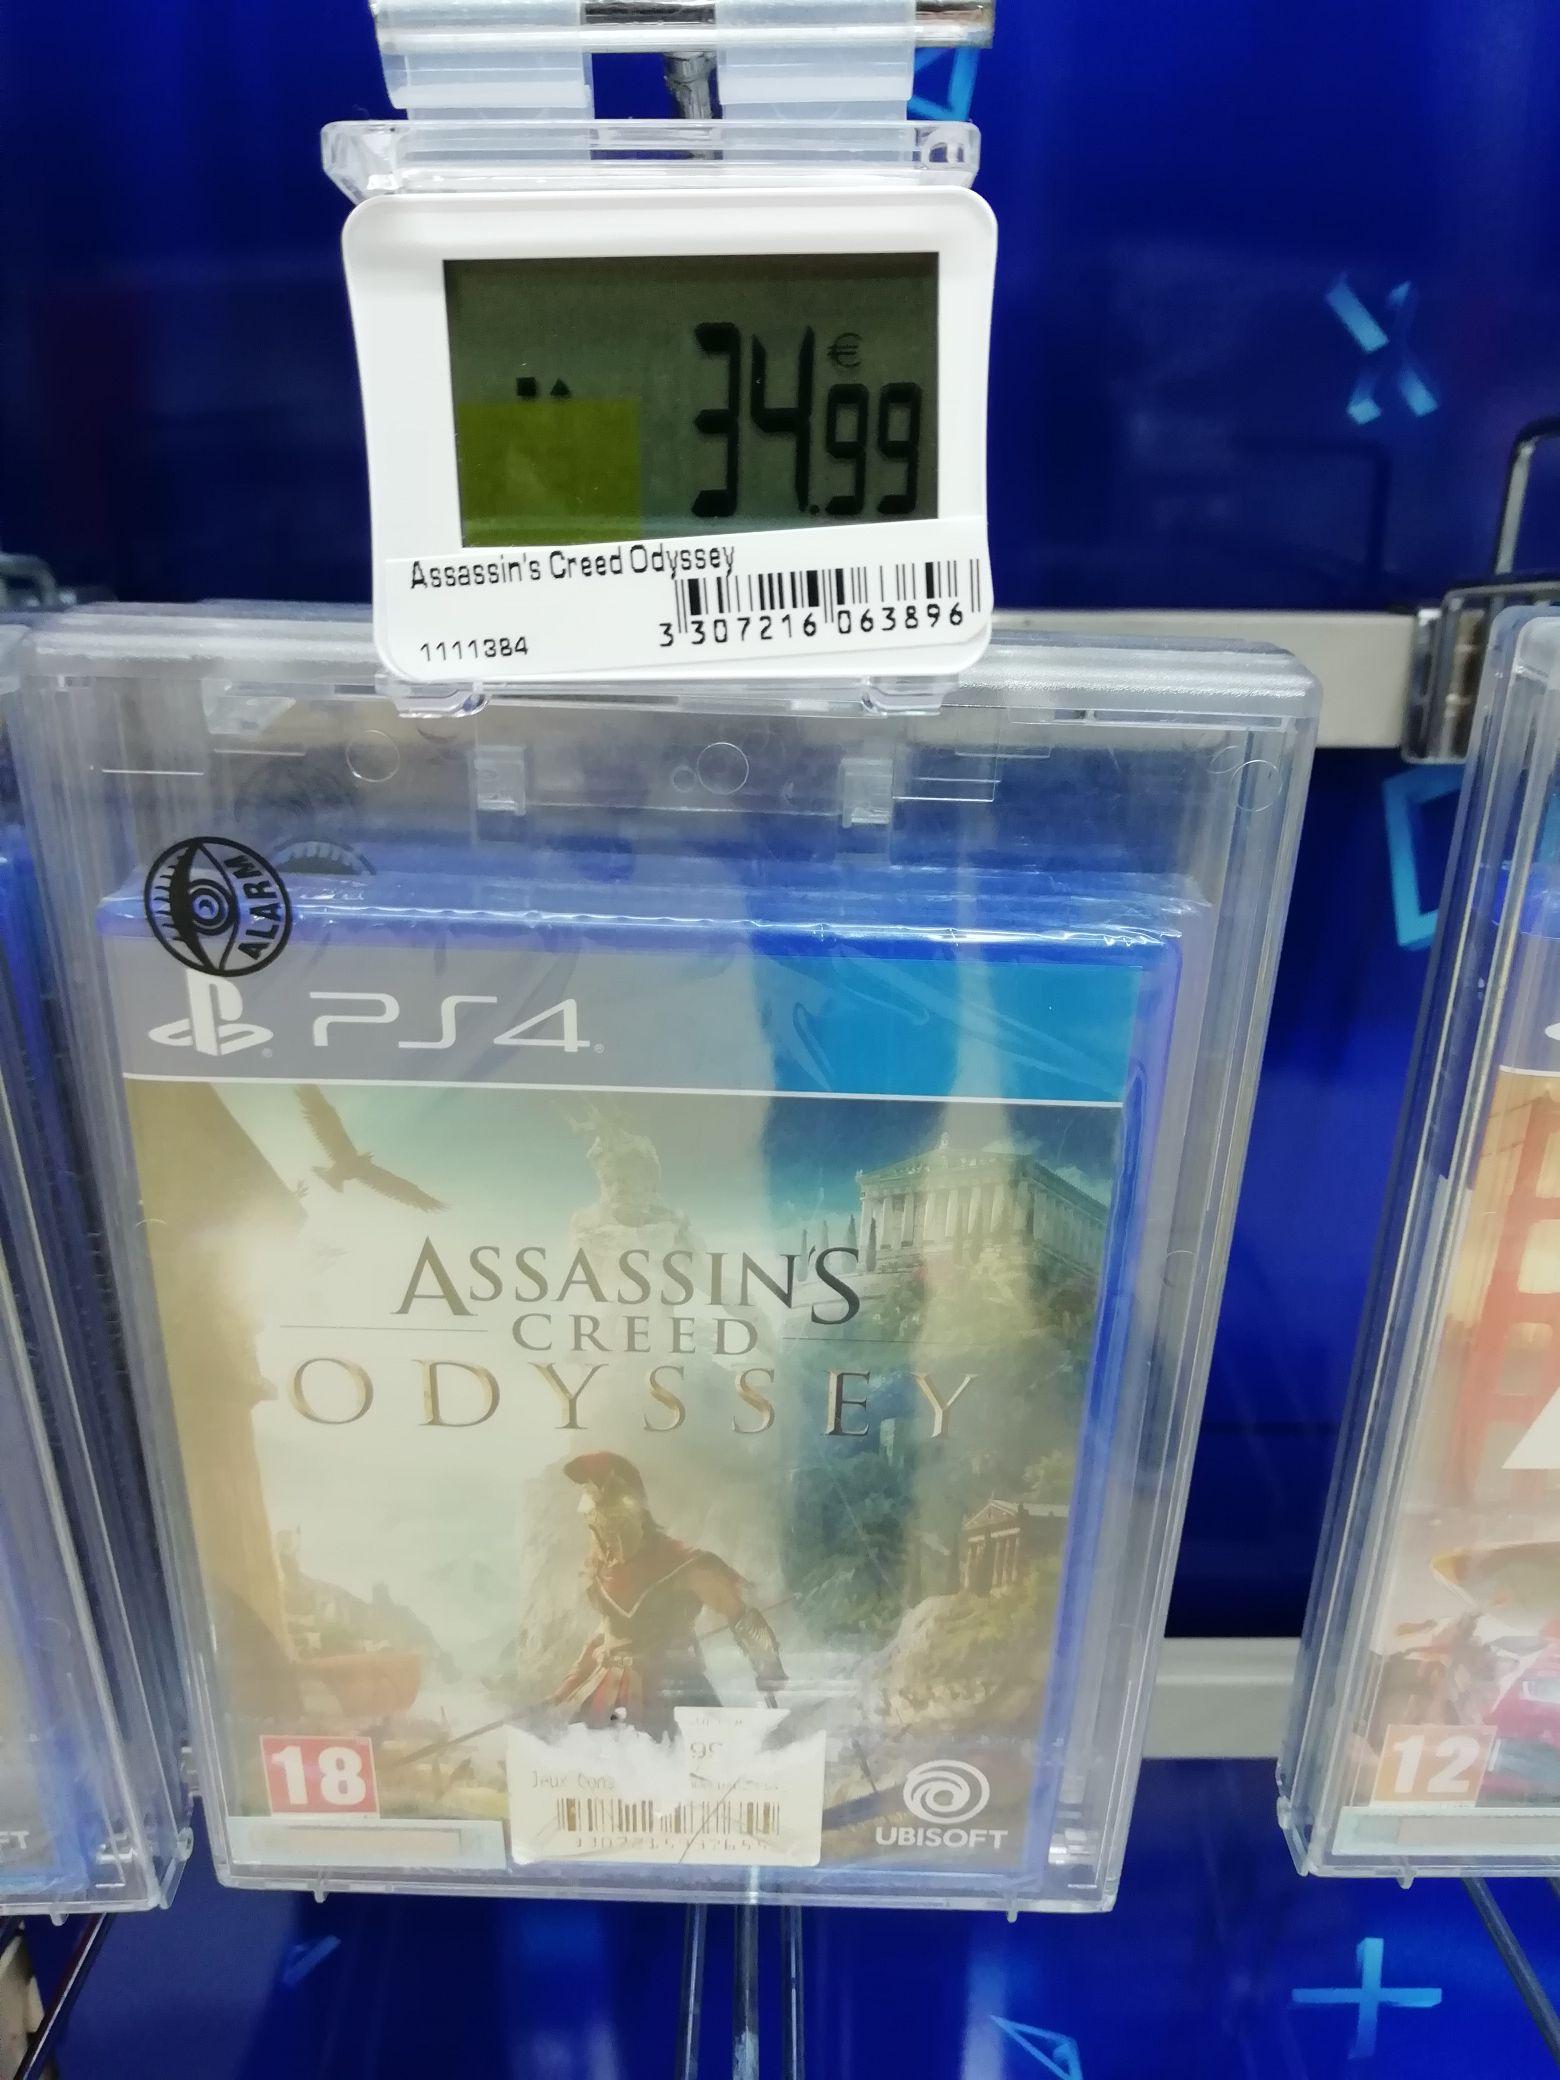 Jeu Assassin's Creed Odyssey sur PS4 - Boulanger Saint Orens (31)